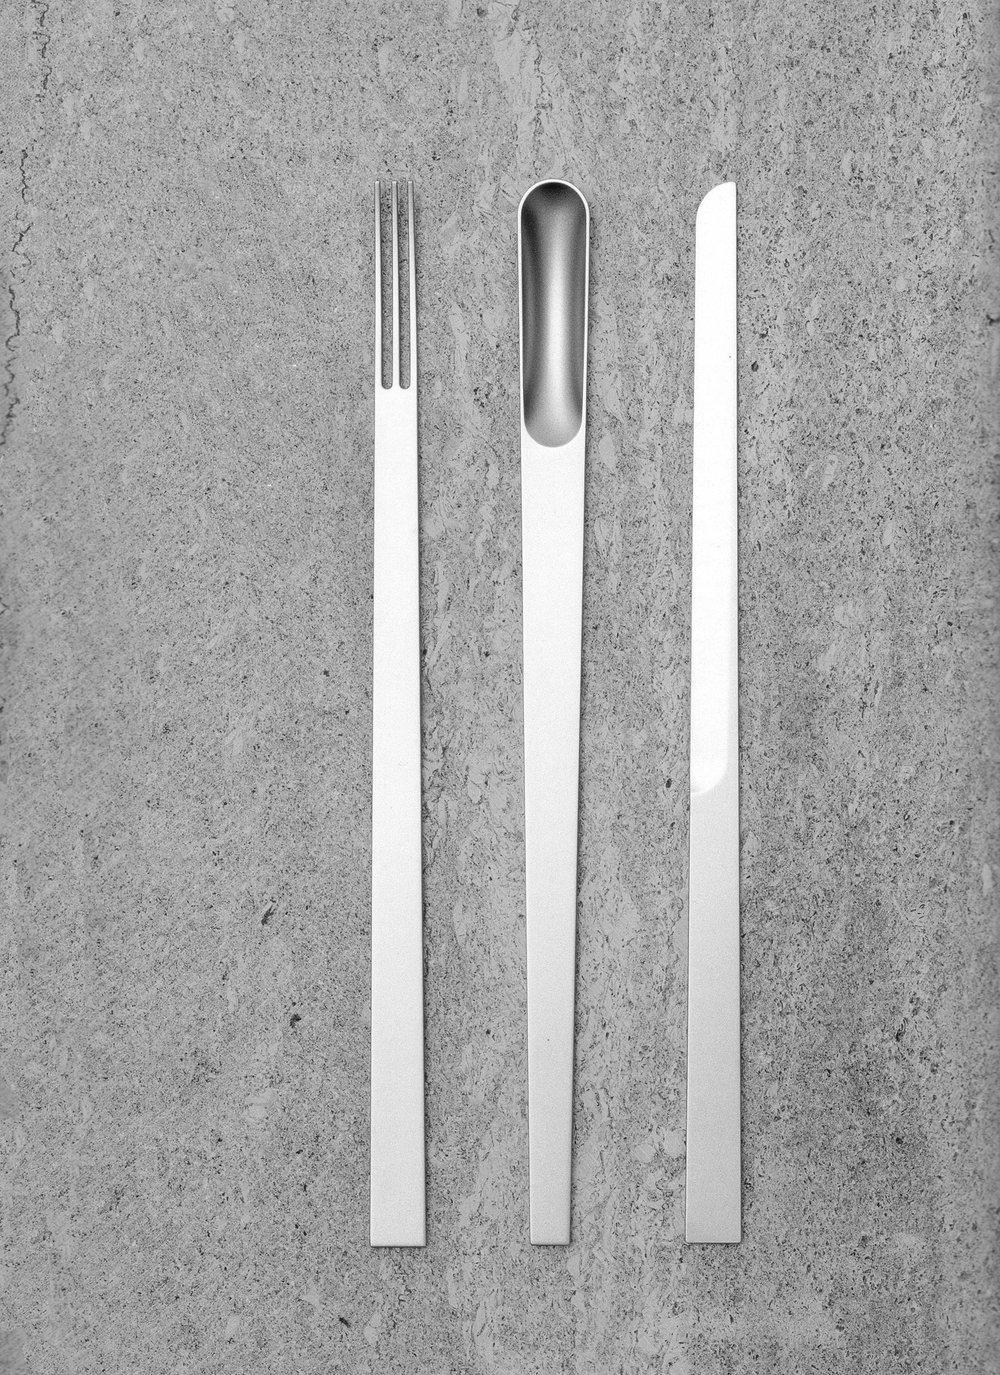 Piattona designed by Elise Rijnberg